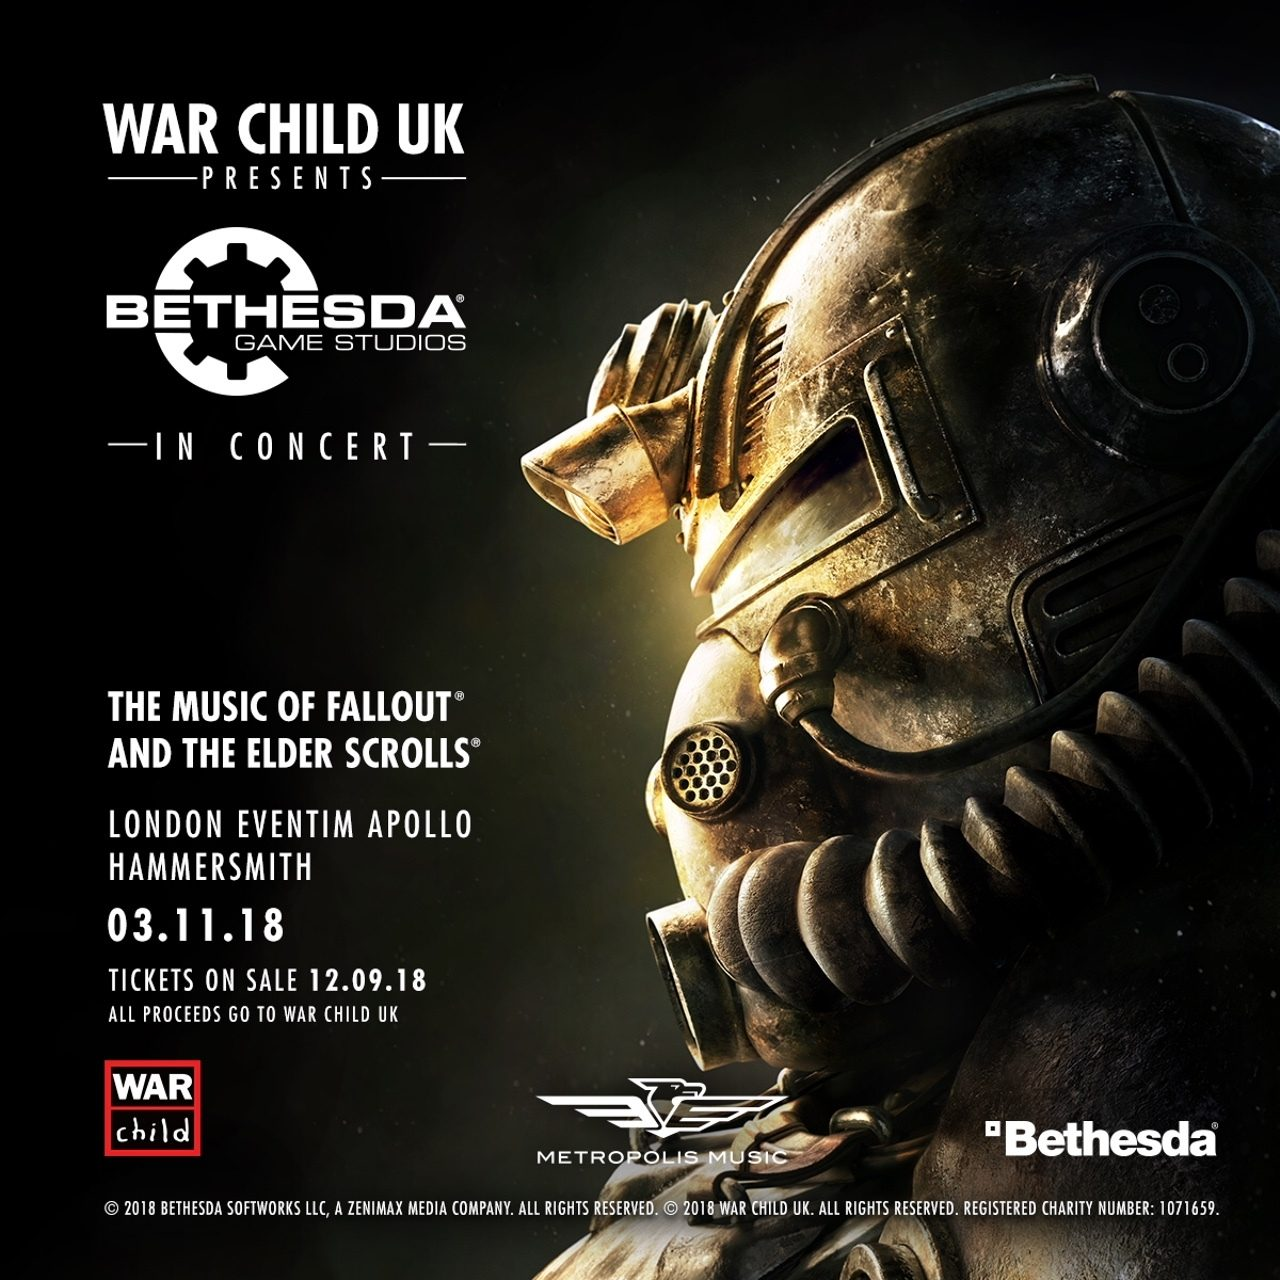 Bethesda War Child UK